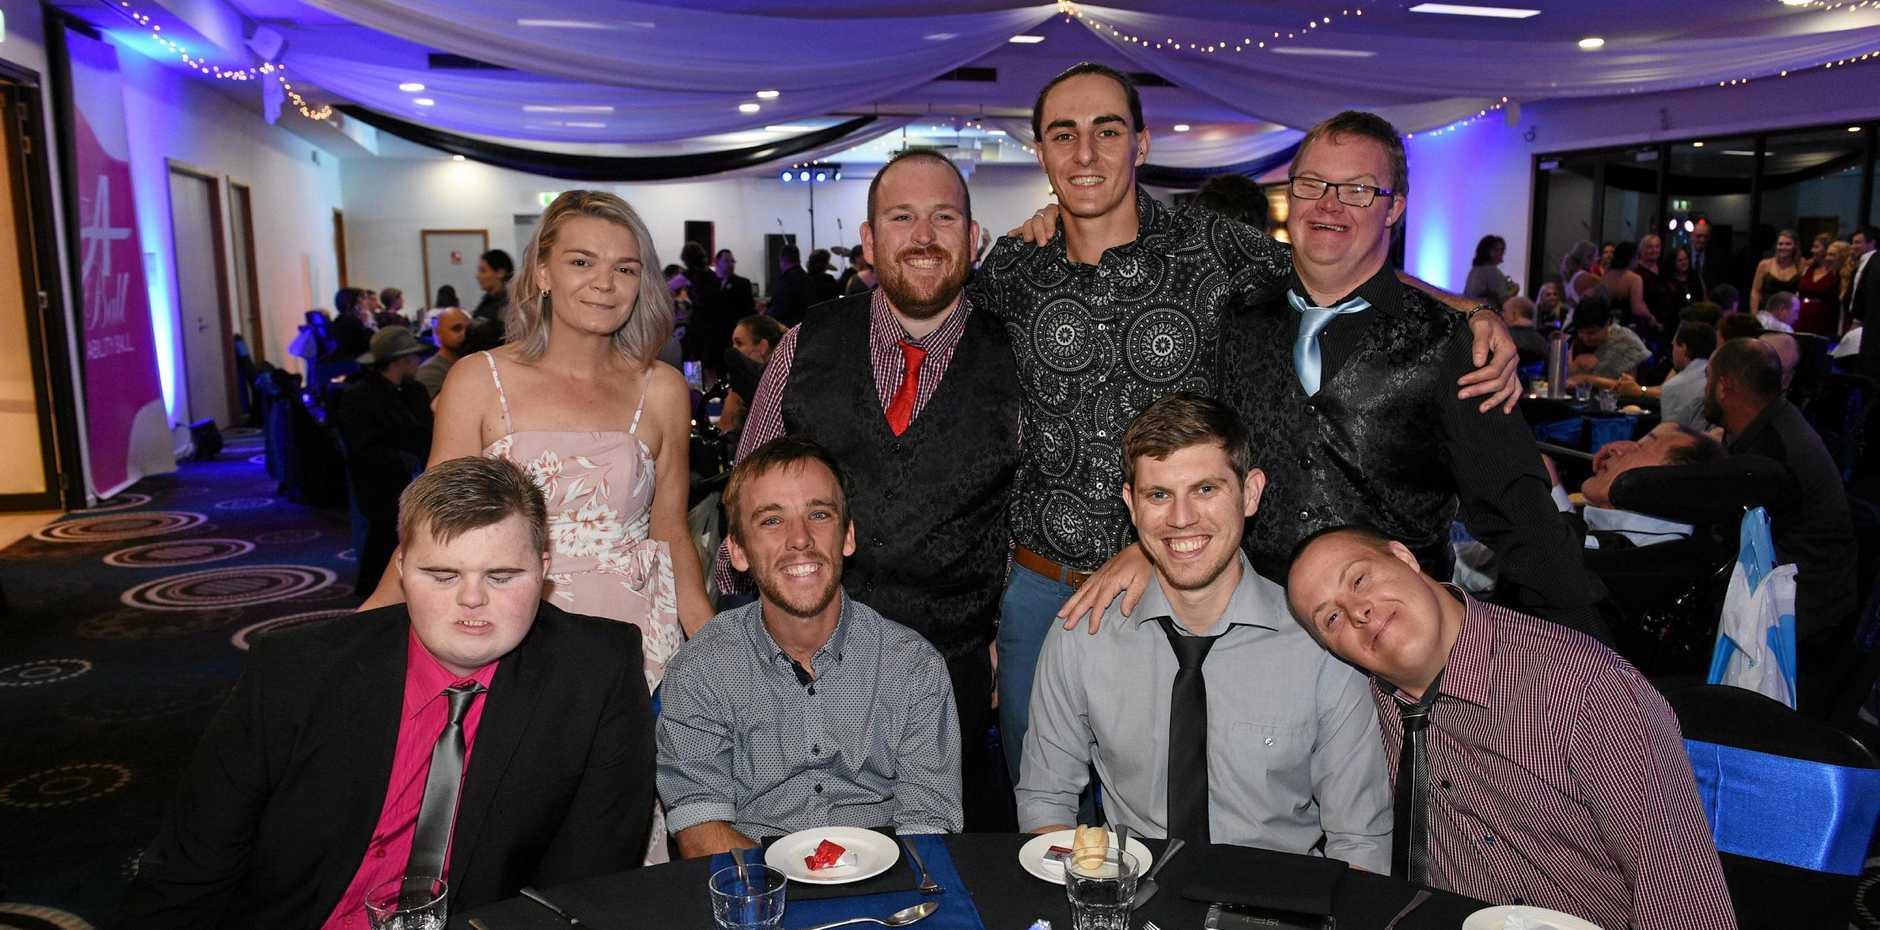 HAVING A BLAST: Josh Zerk, Aaron Groat, Daniel Hayhurst and Todd Malcolm. (Back left) Leah Kingdom, Todd Kirk, Clayton Killick and Daniel Blackhurst at last year's Fraser Coast Ability Ball.